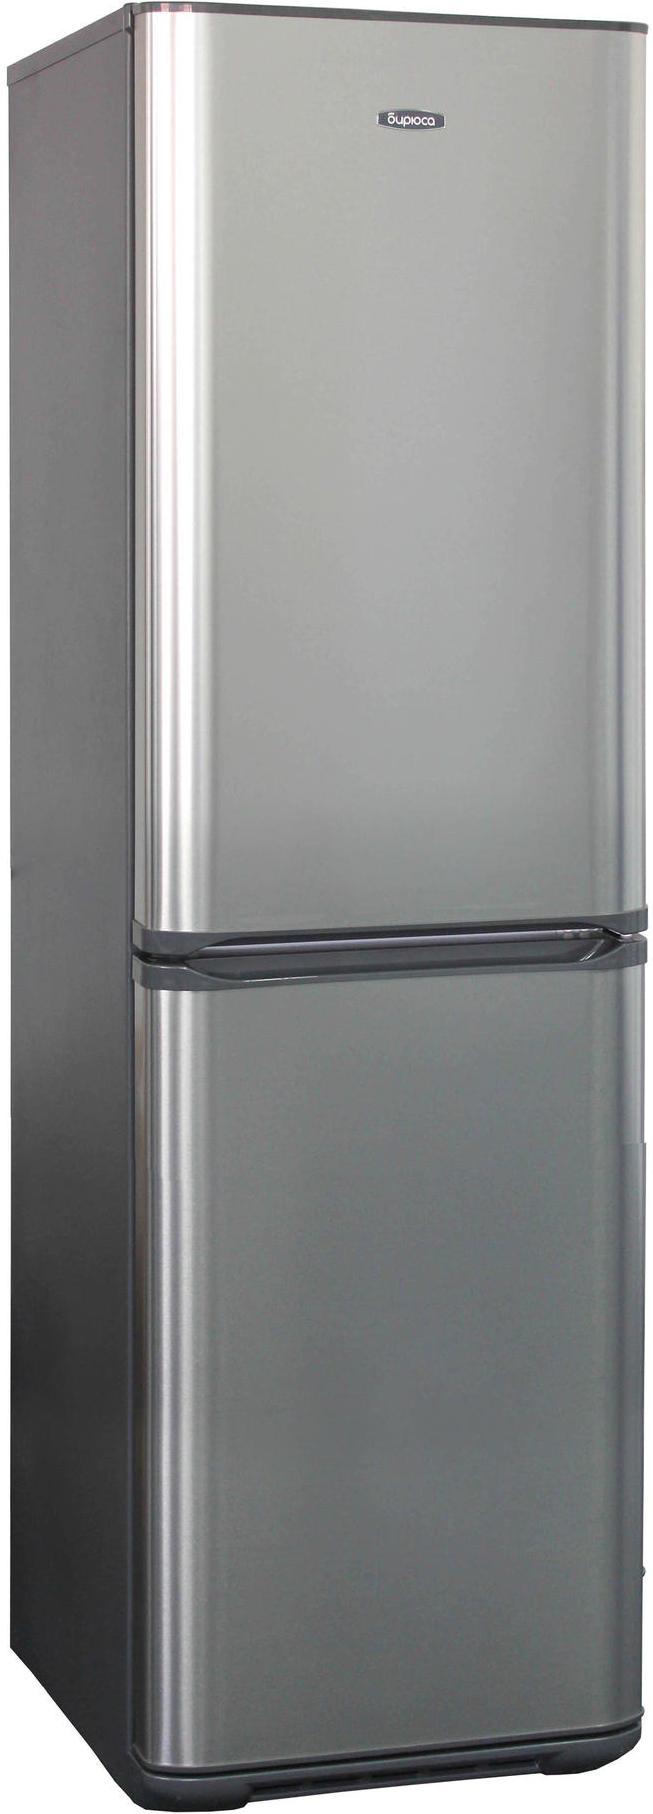 Холодильник Бирюса I131